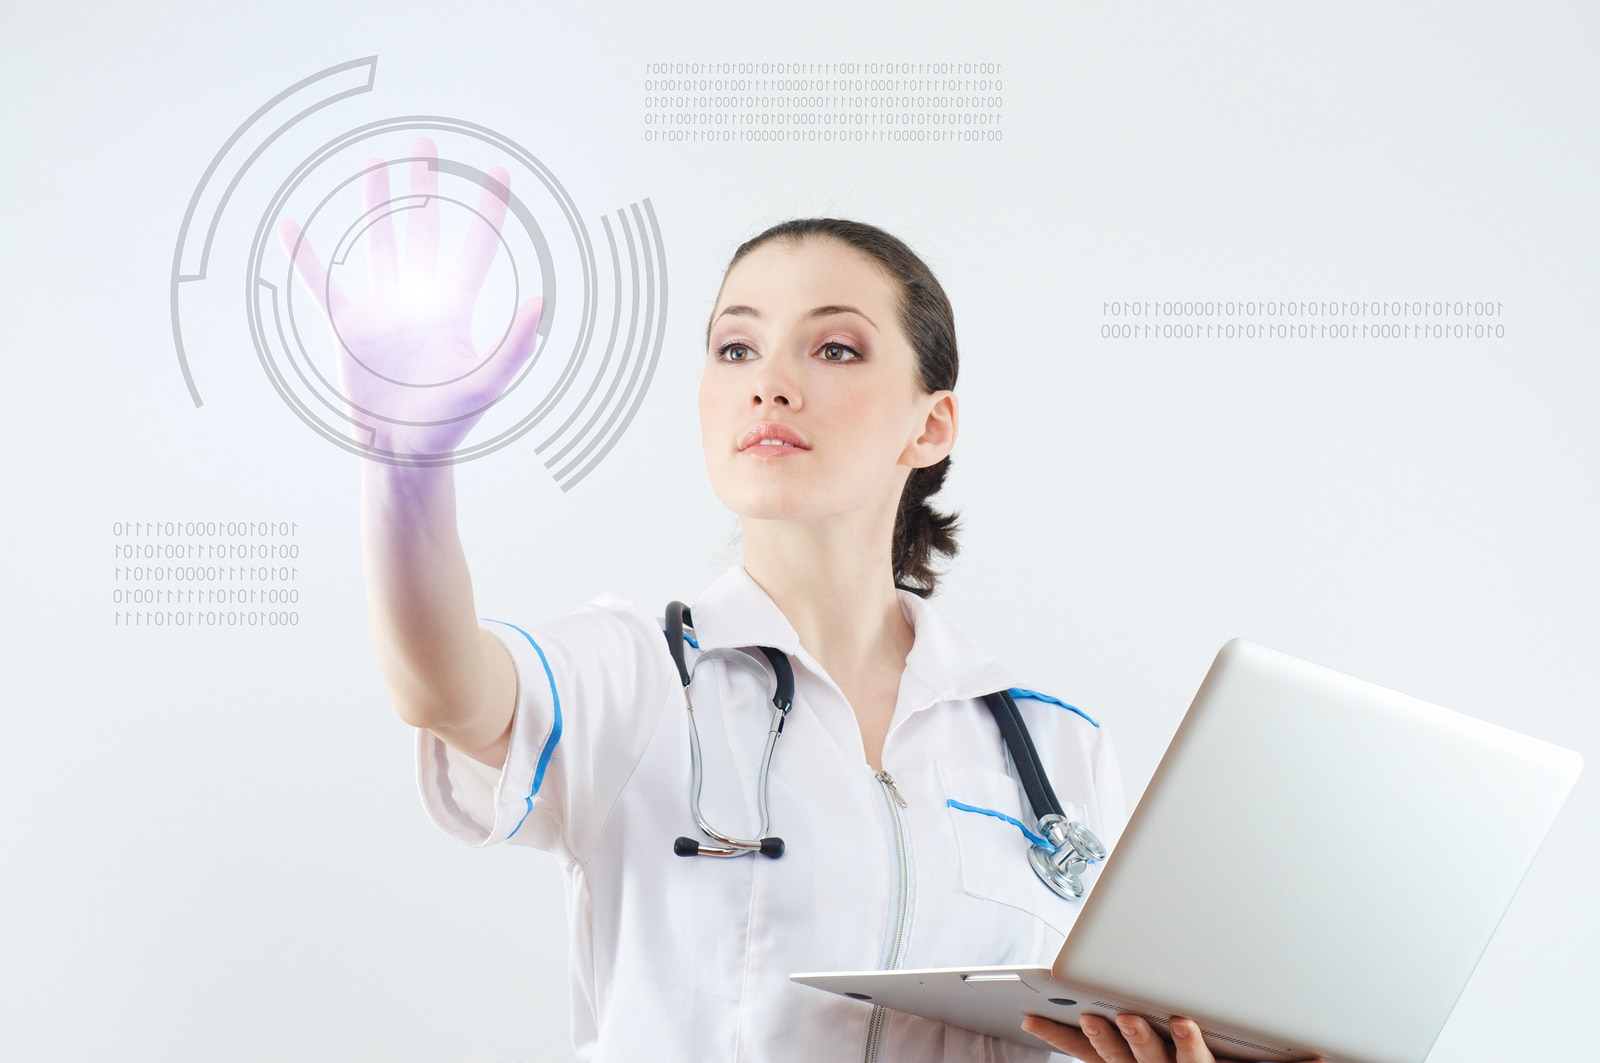 NC HIE - HealthConnex